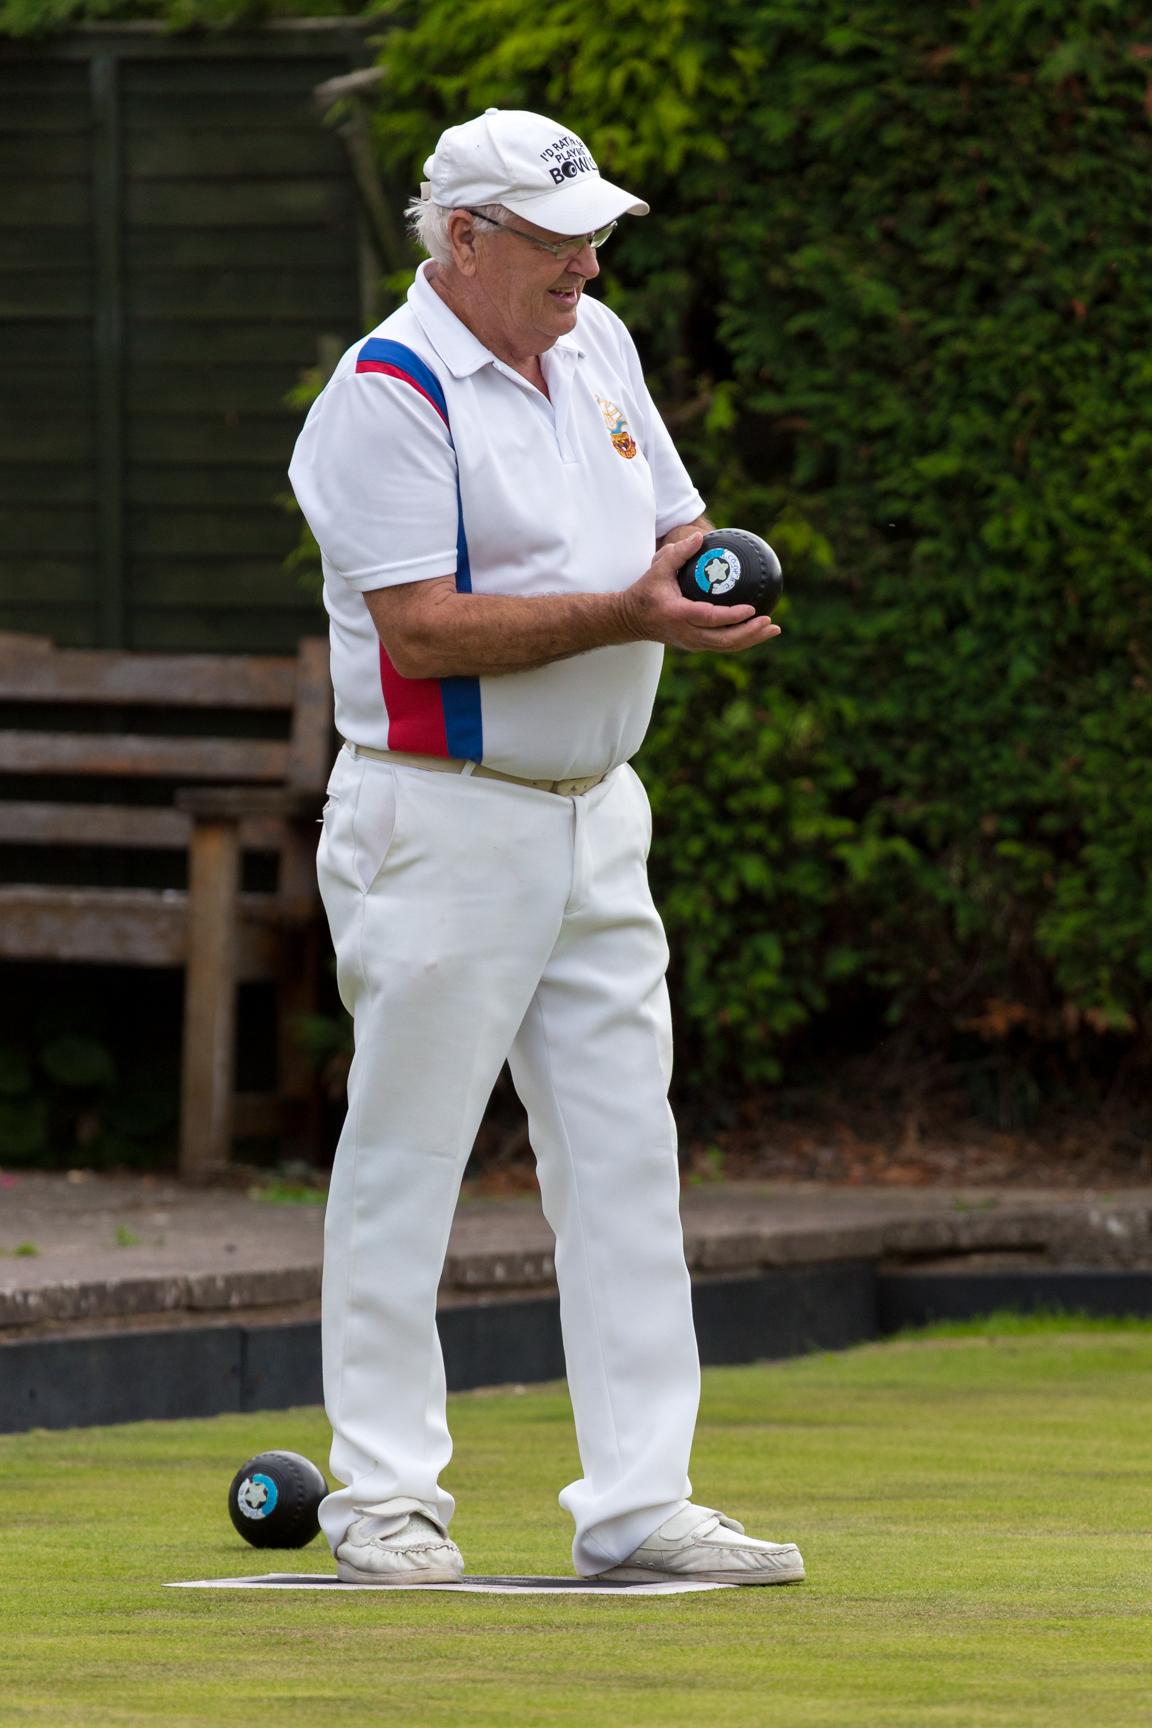 ANDY ANDREWS MEMORIAL CUP   Winner - Colin Bruton  Runner Up - John Norman